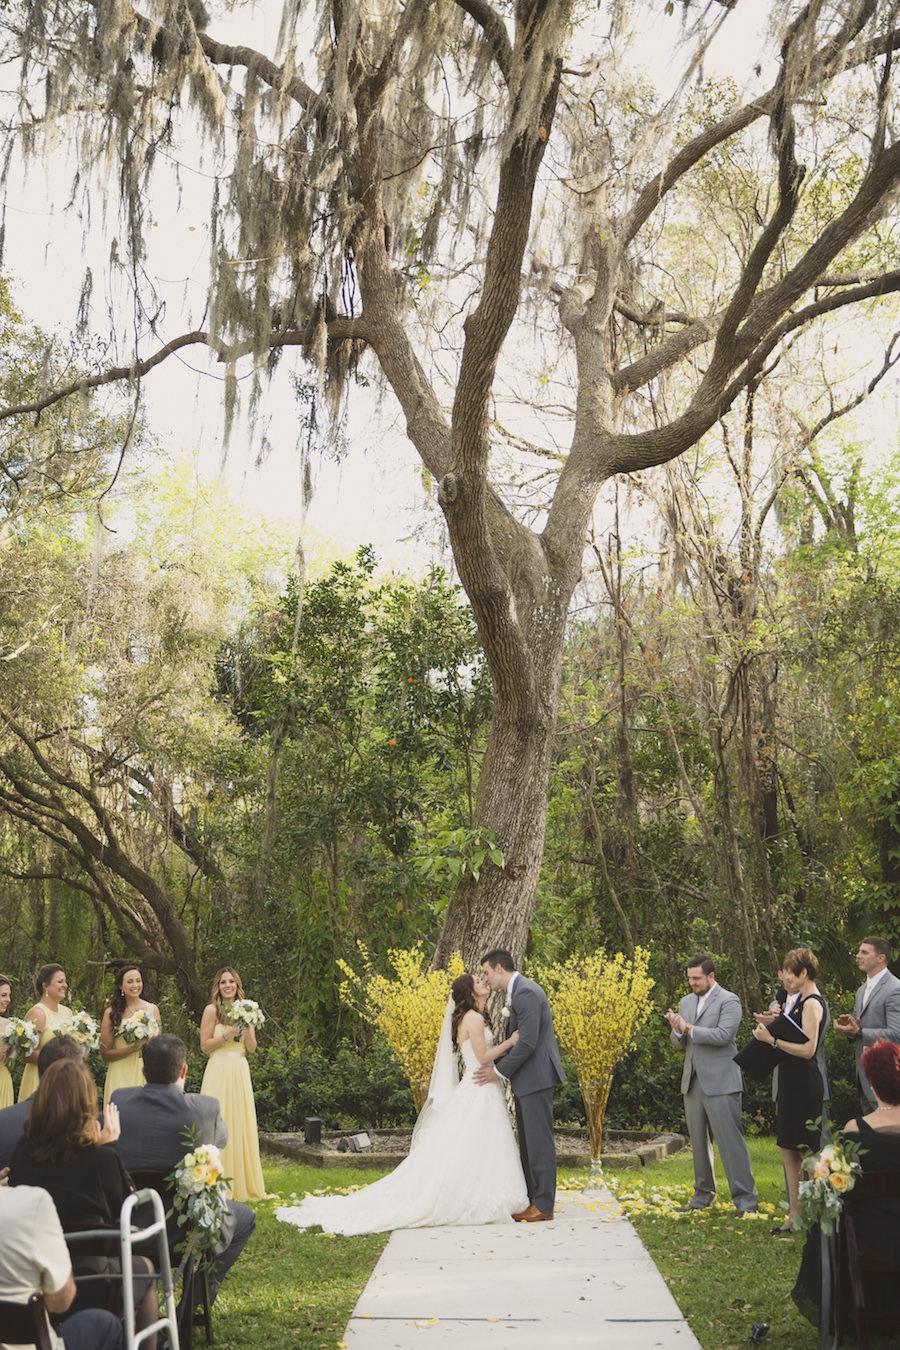 Rustic Outdoor Florida Wedding Ceremony Under Spanish Moss Tree   Sarasota Wedding Venue Bakers Ranch